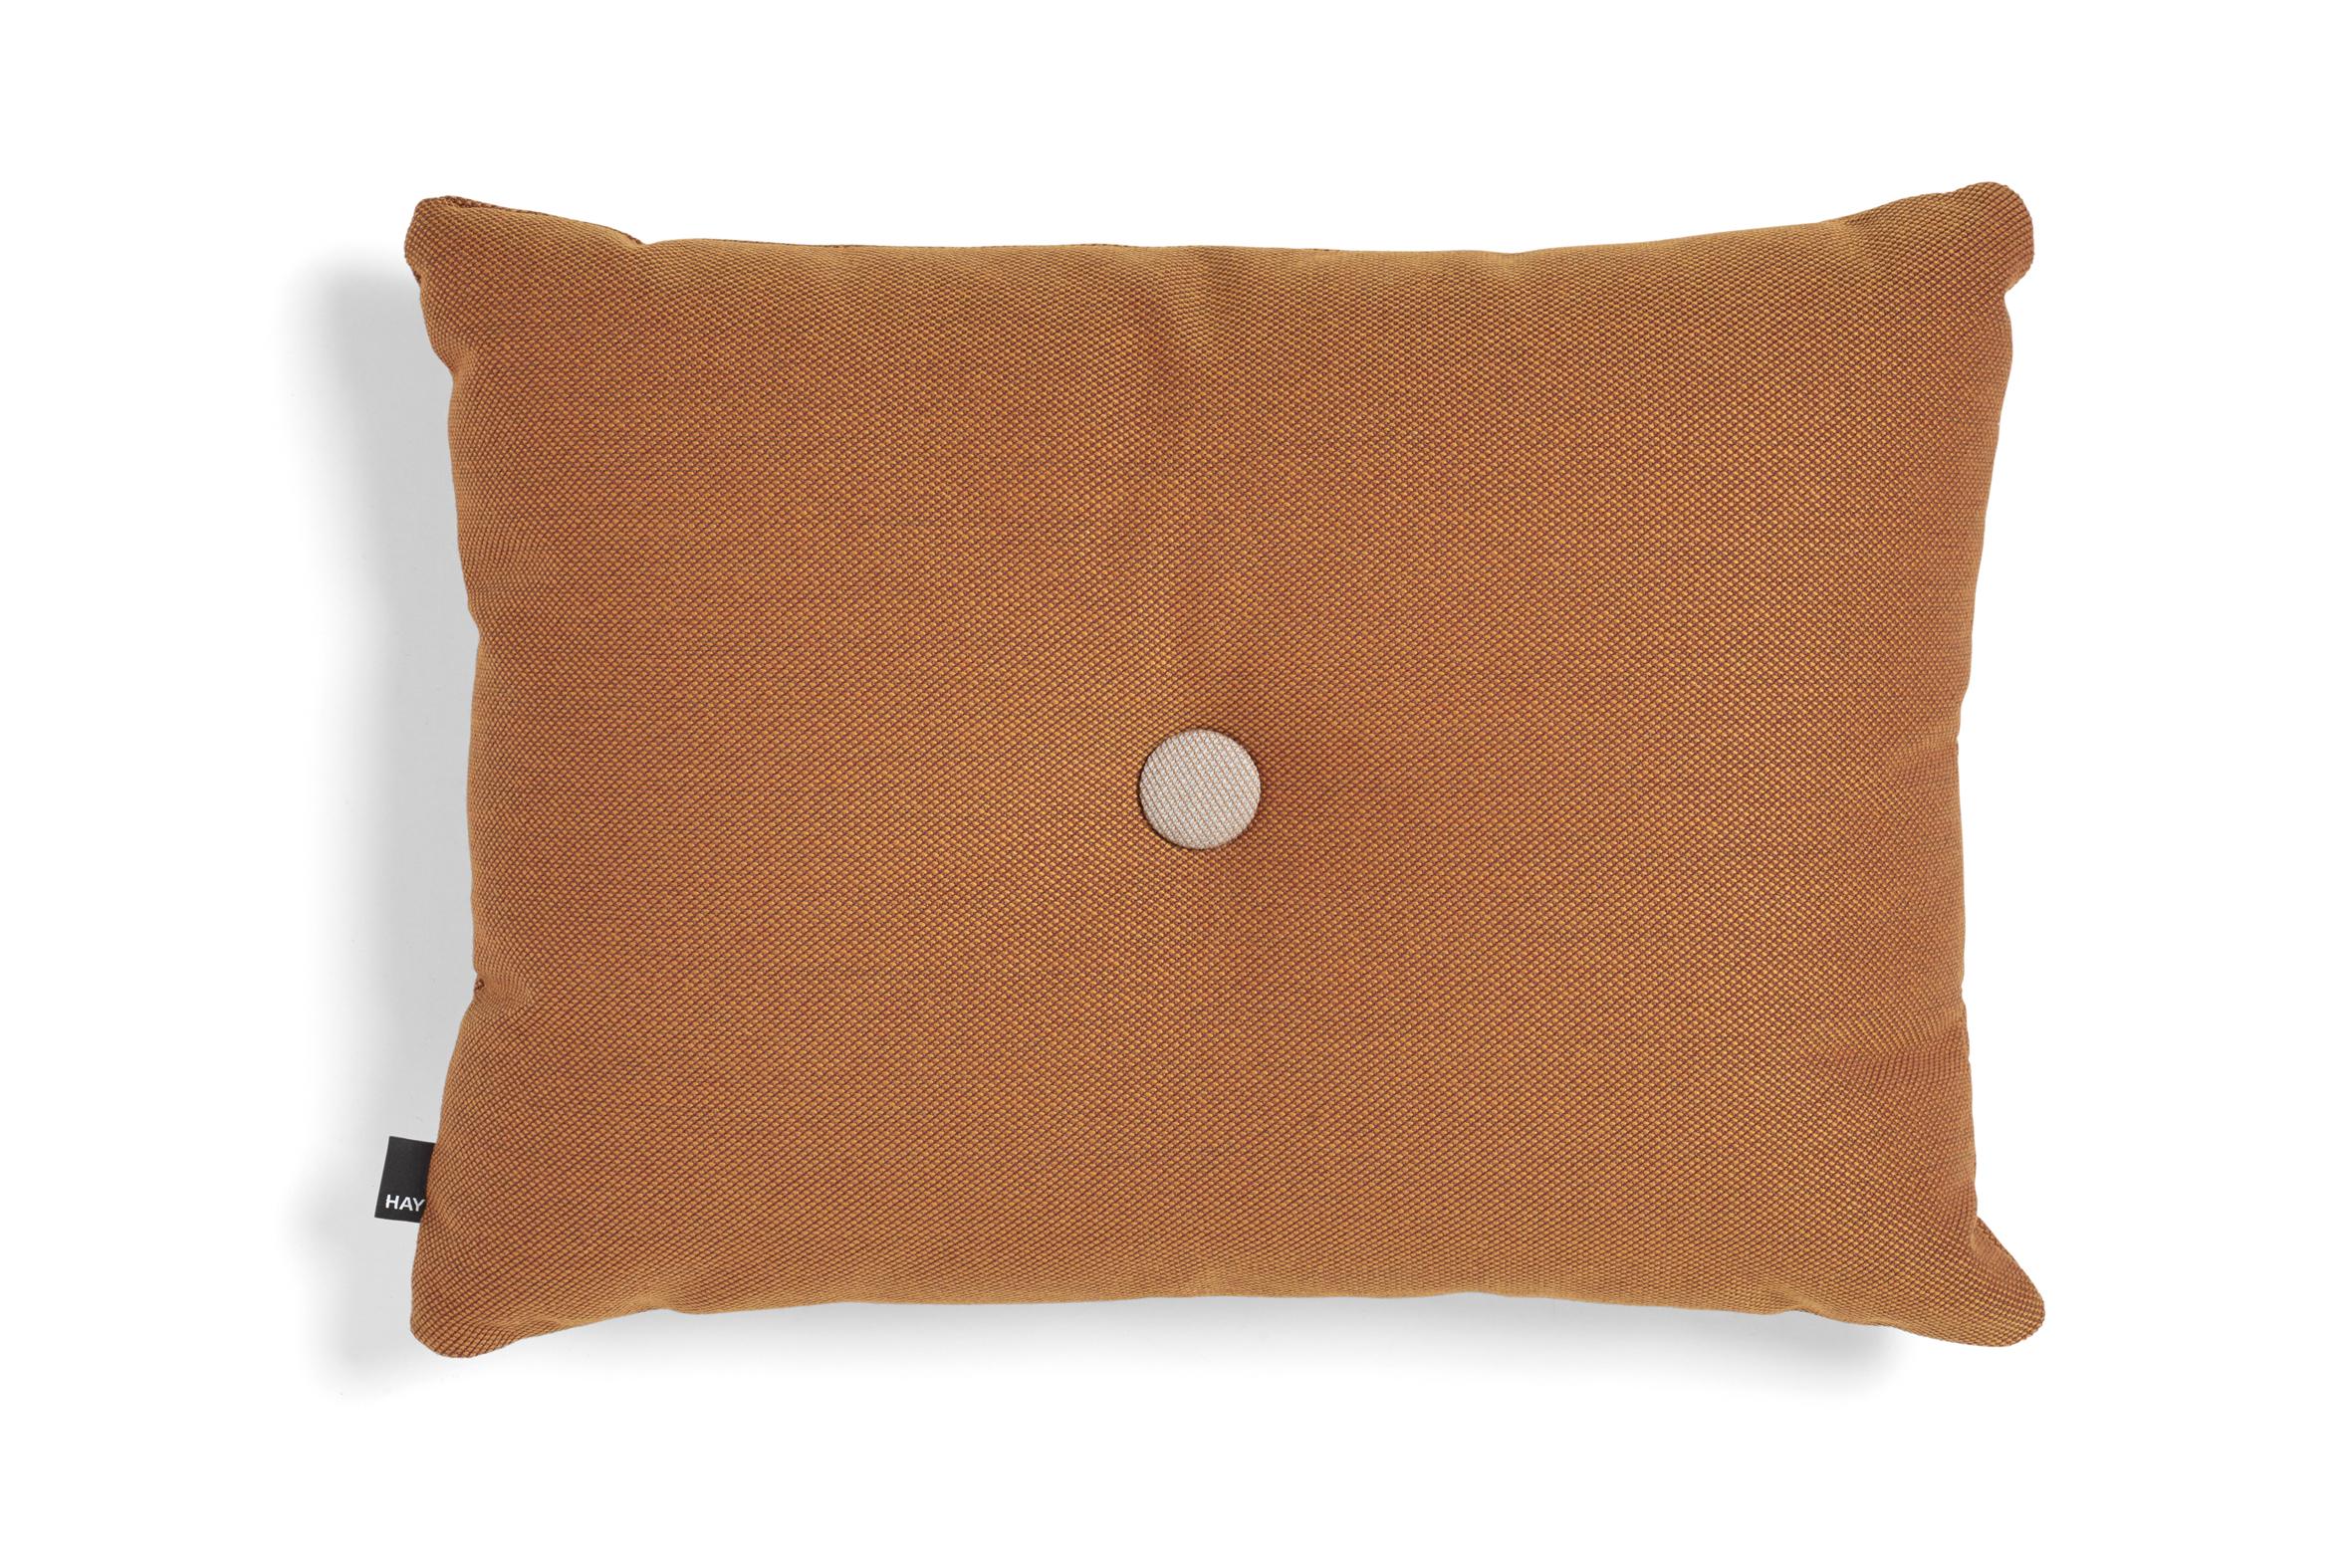 HAY - Dot Cushion Steelcut Trio - Orange (507018)